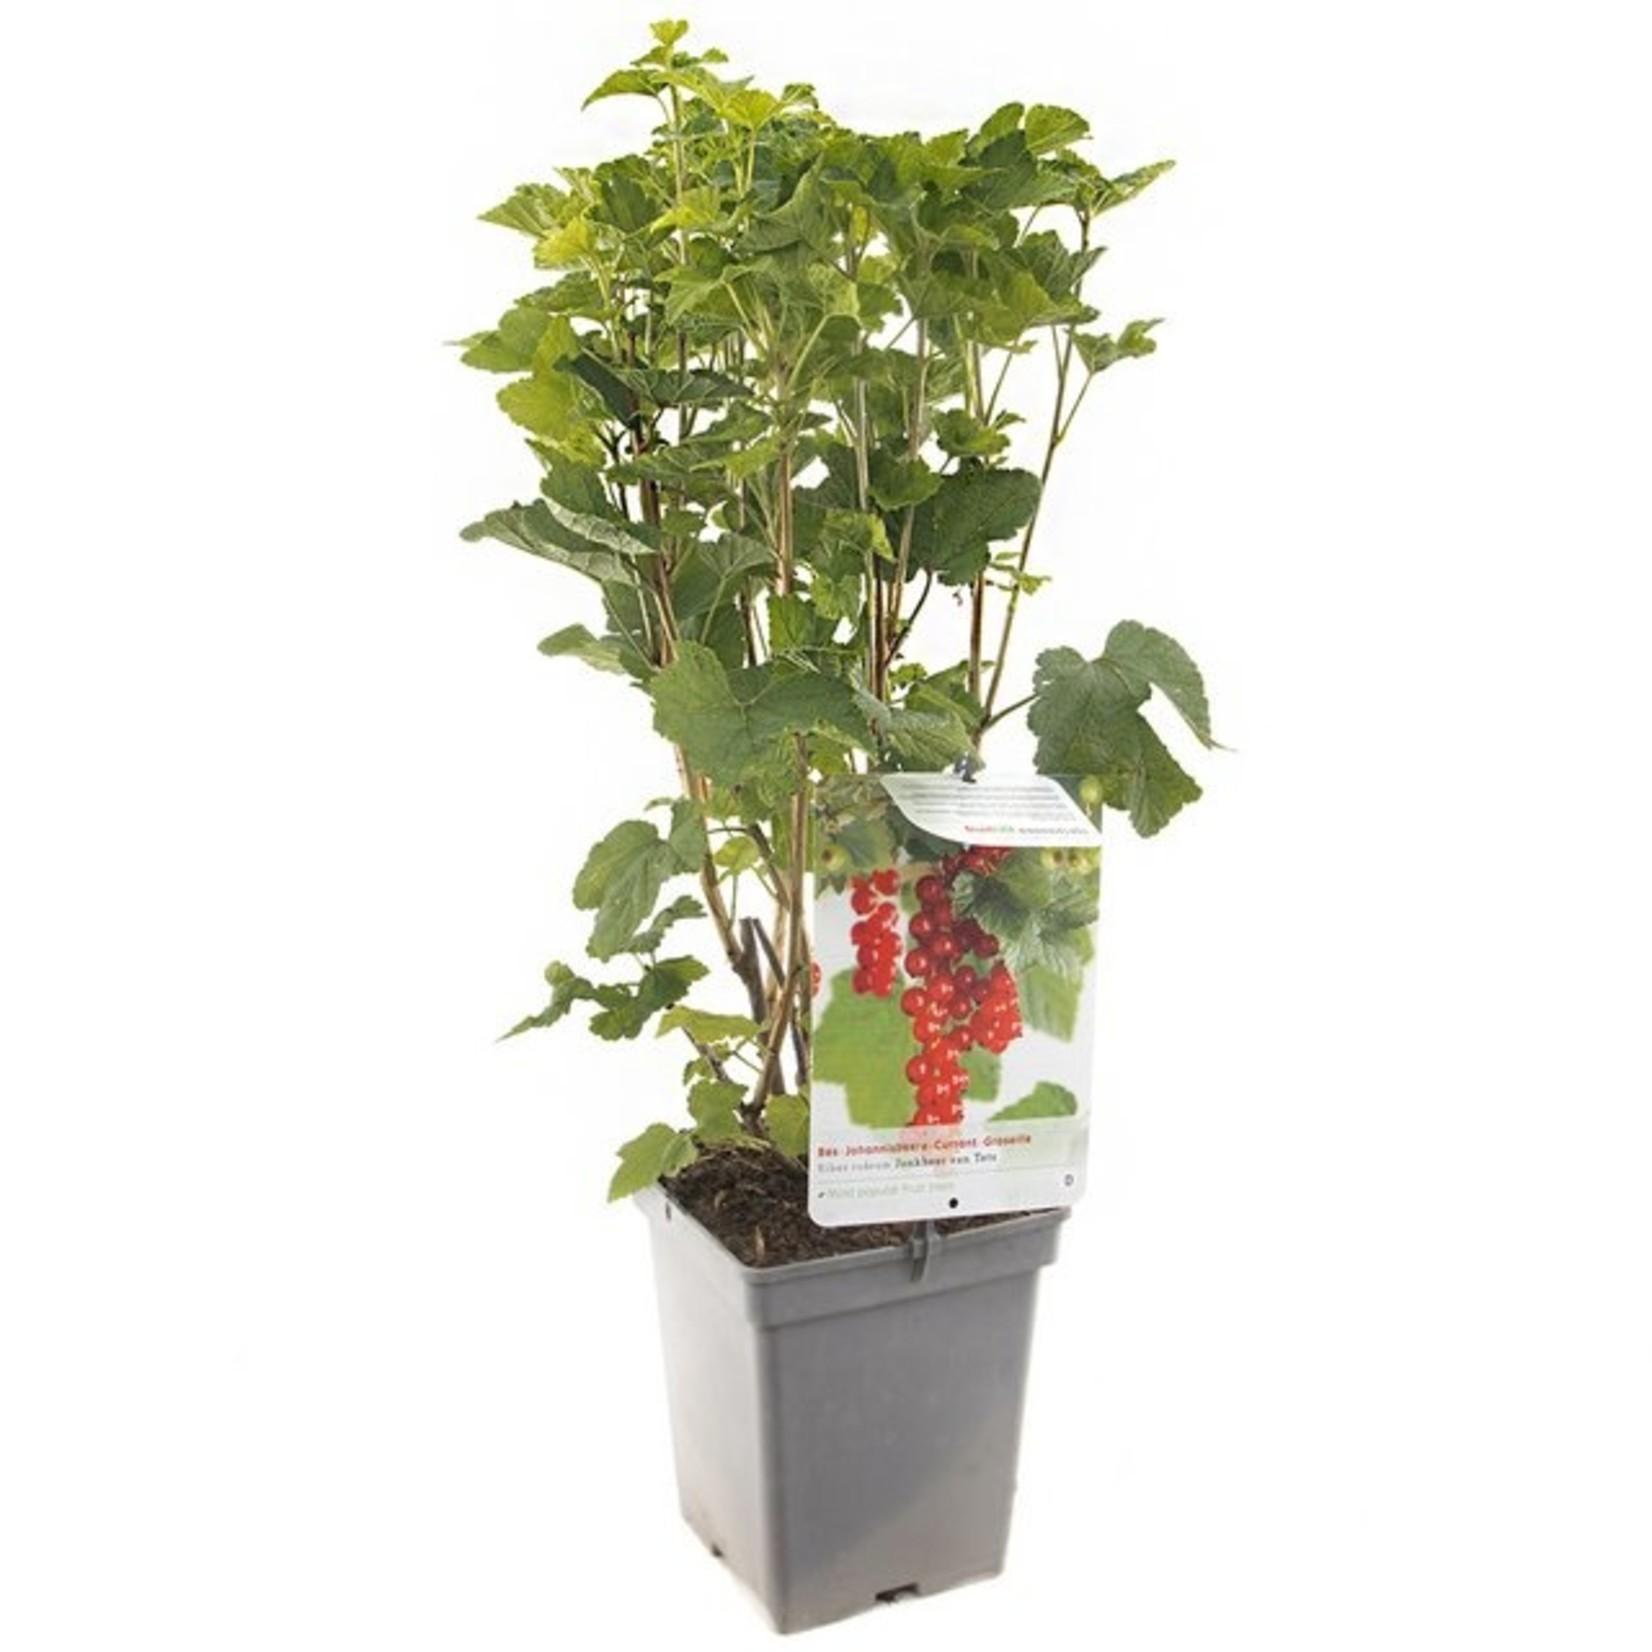 Ribes r. 'Jonkheer van Tets' (Rode bes)